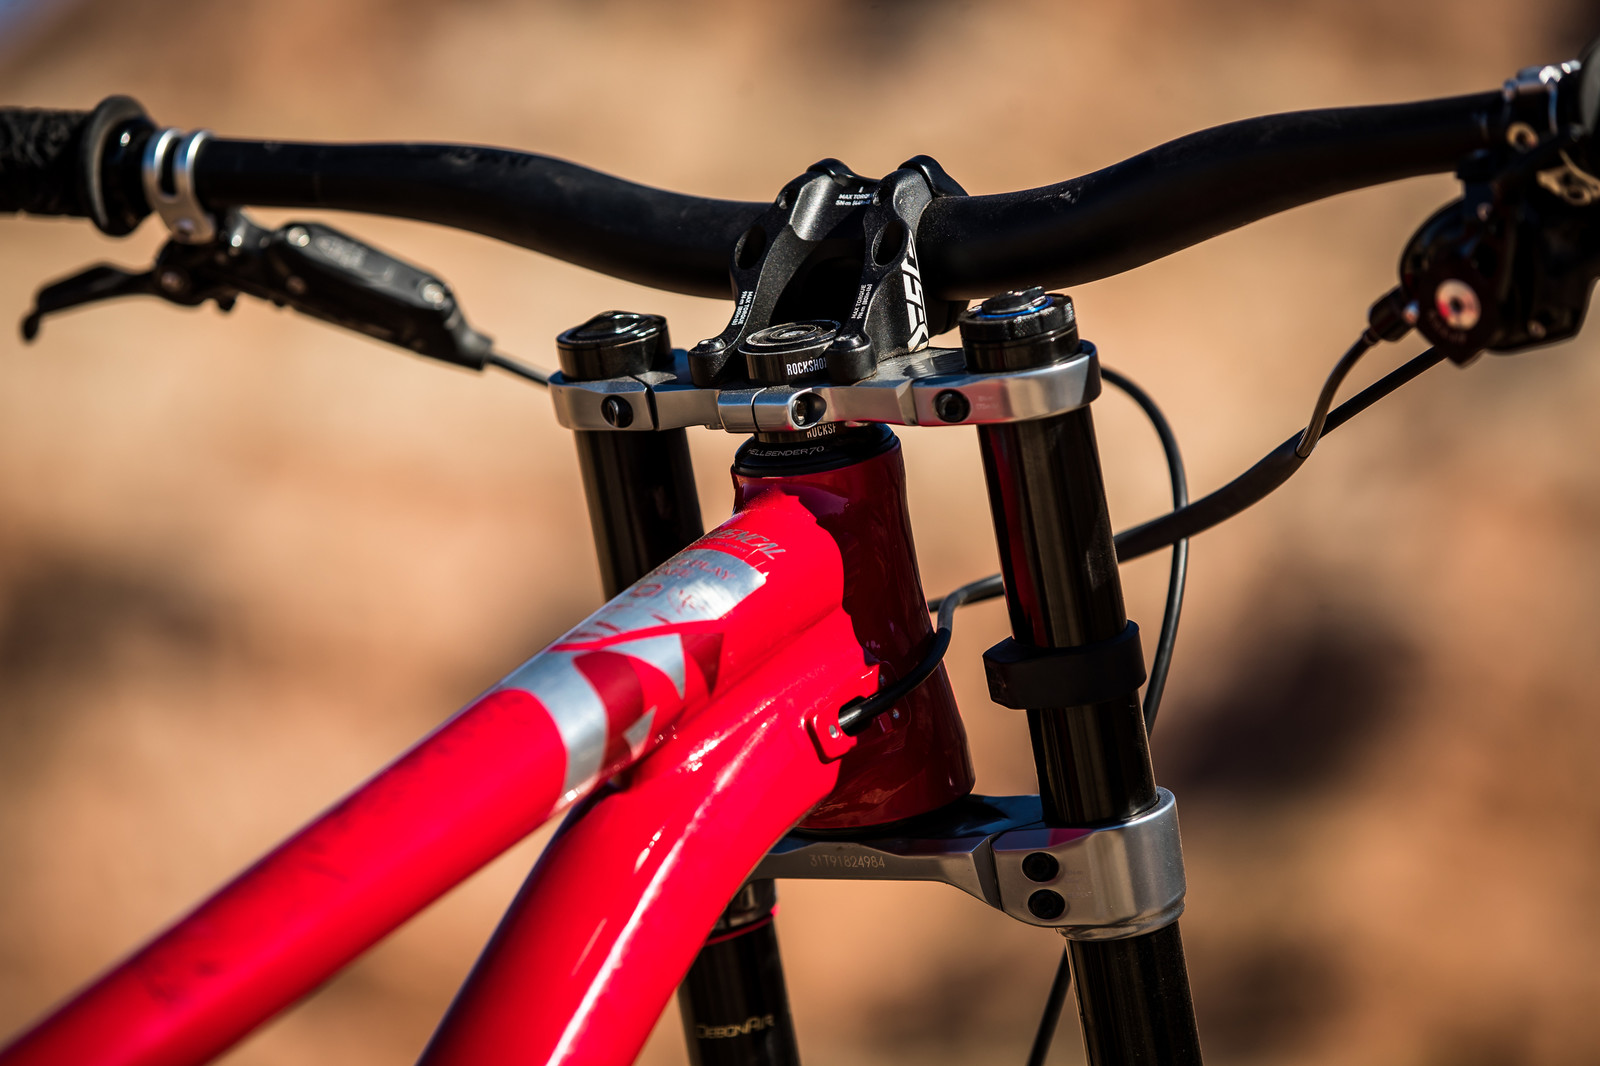 Cockpit Views | Kyle Strait's 2019 Rampage Bike - RAMPAGE BIKE - Kyle Strait's Commencal Furious - Mountain Biking Pictures - Vital MTB